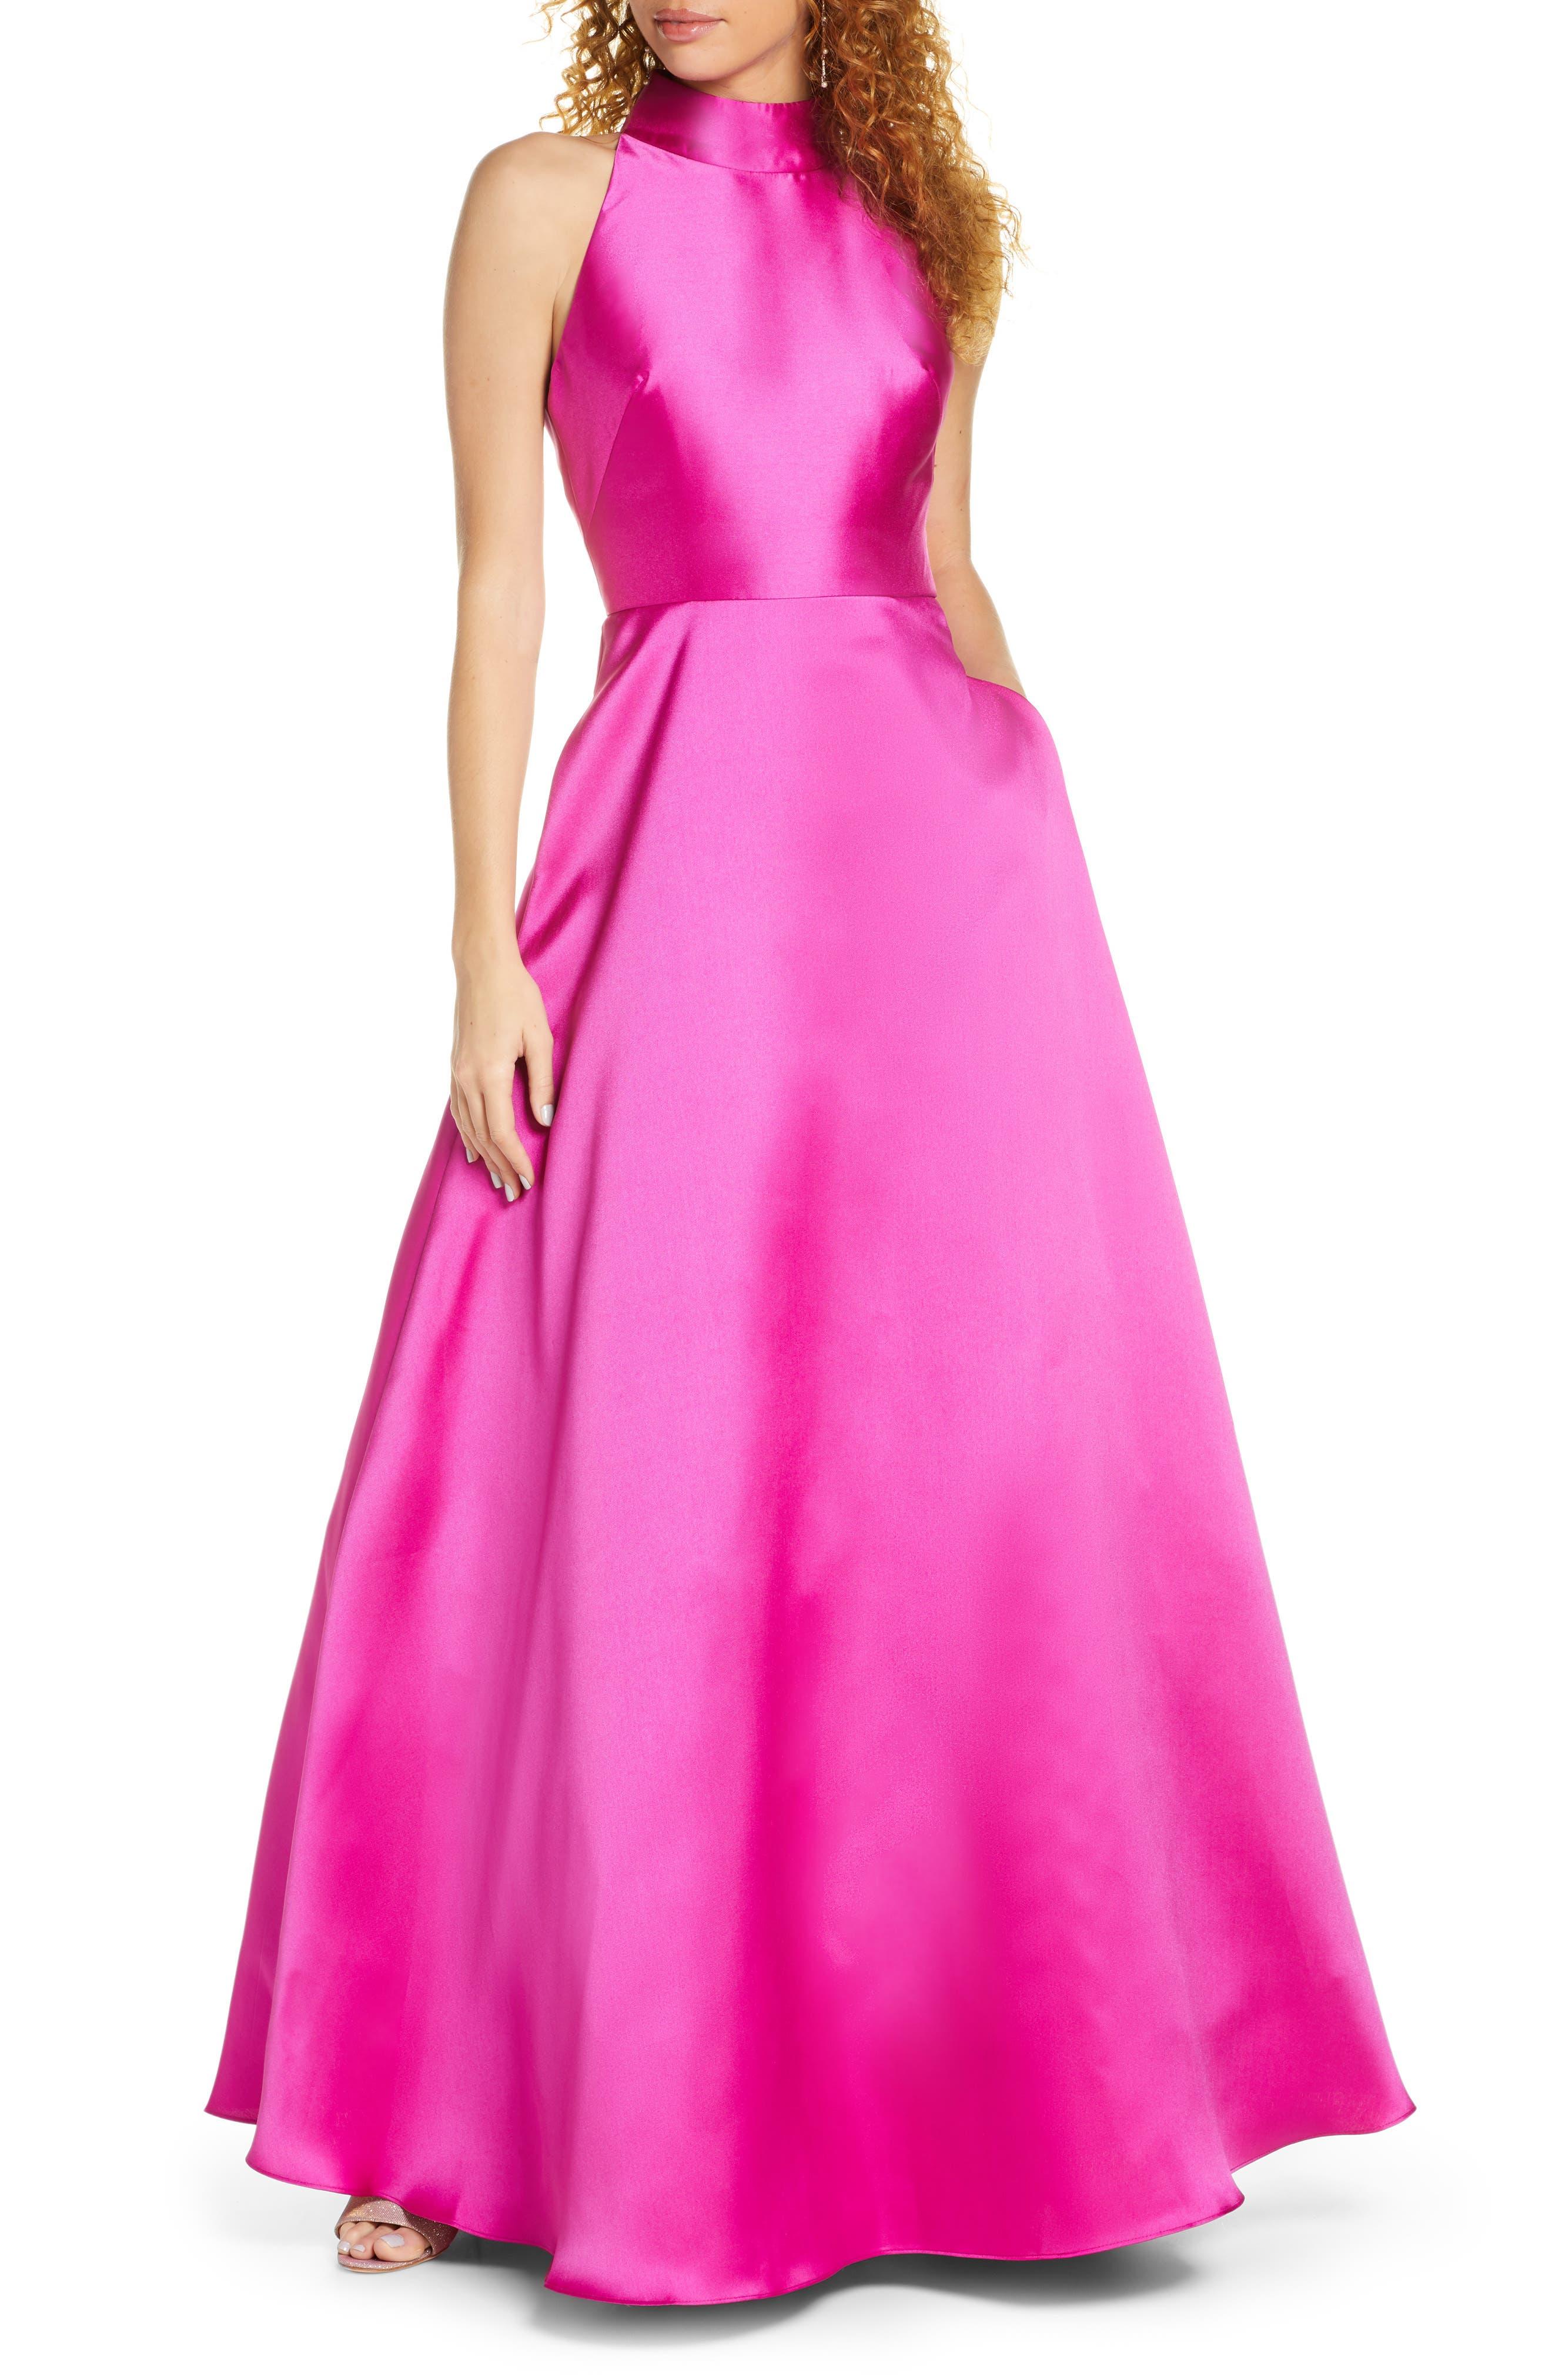 Satin Mock Neck Evening Dress